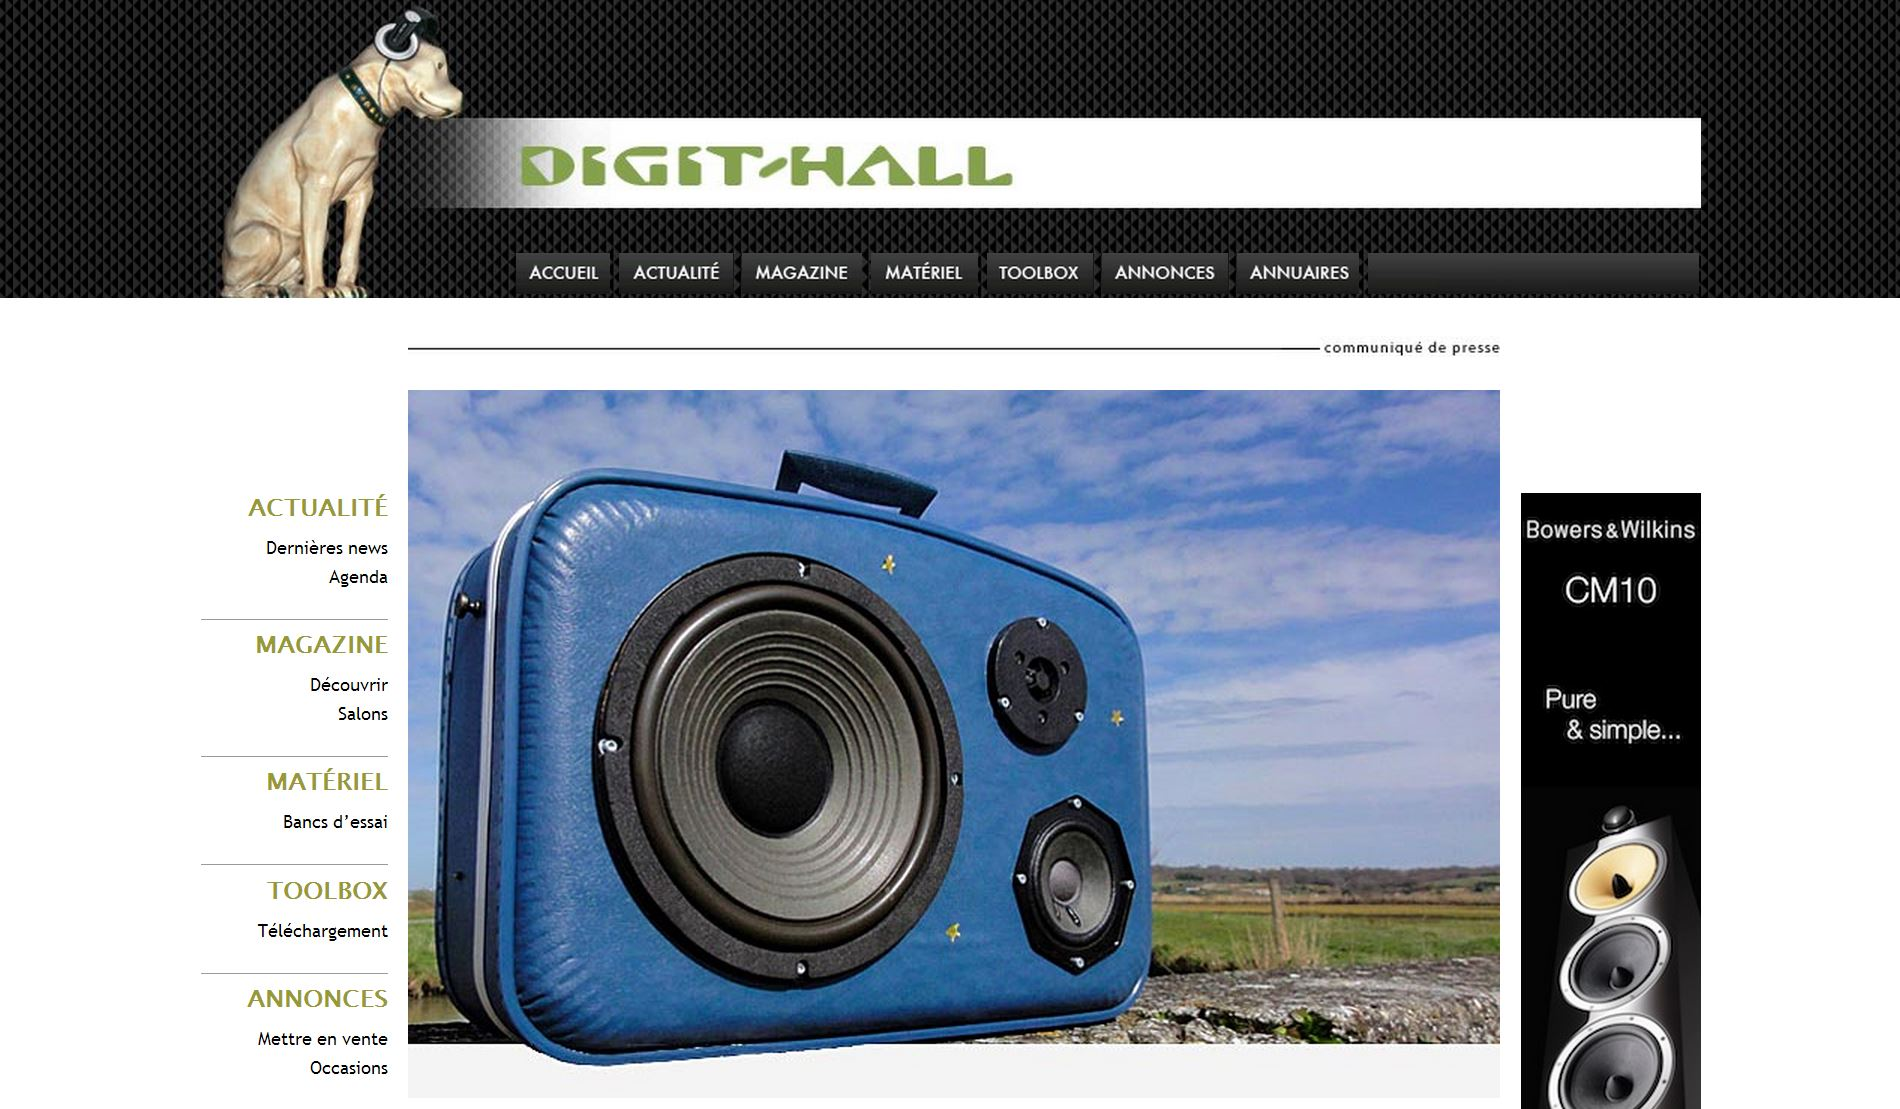 Valise Musicale chez Digit-Hall.com